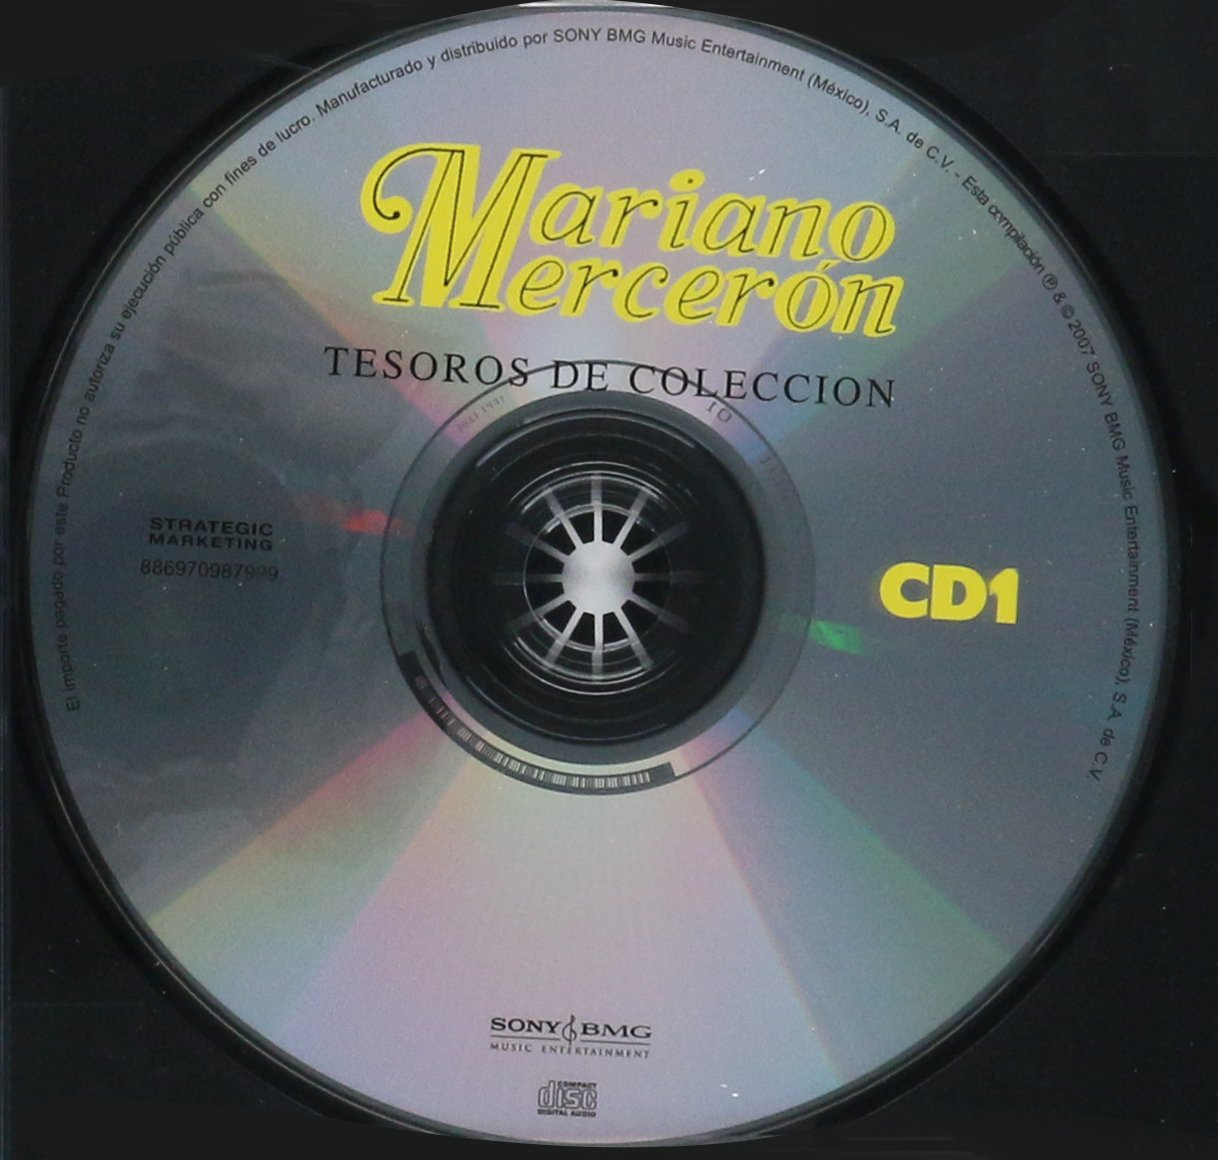 MARIANO MERCERON - TESOROS DE COLECCION MARIANO MERCERON - Amazon.com Music